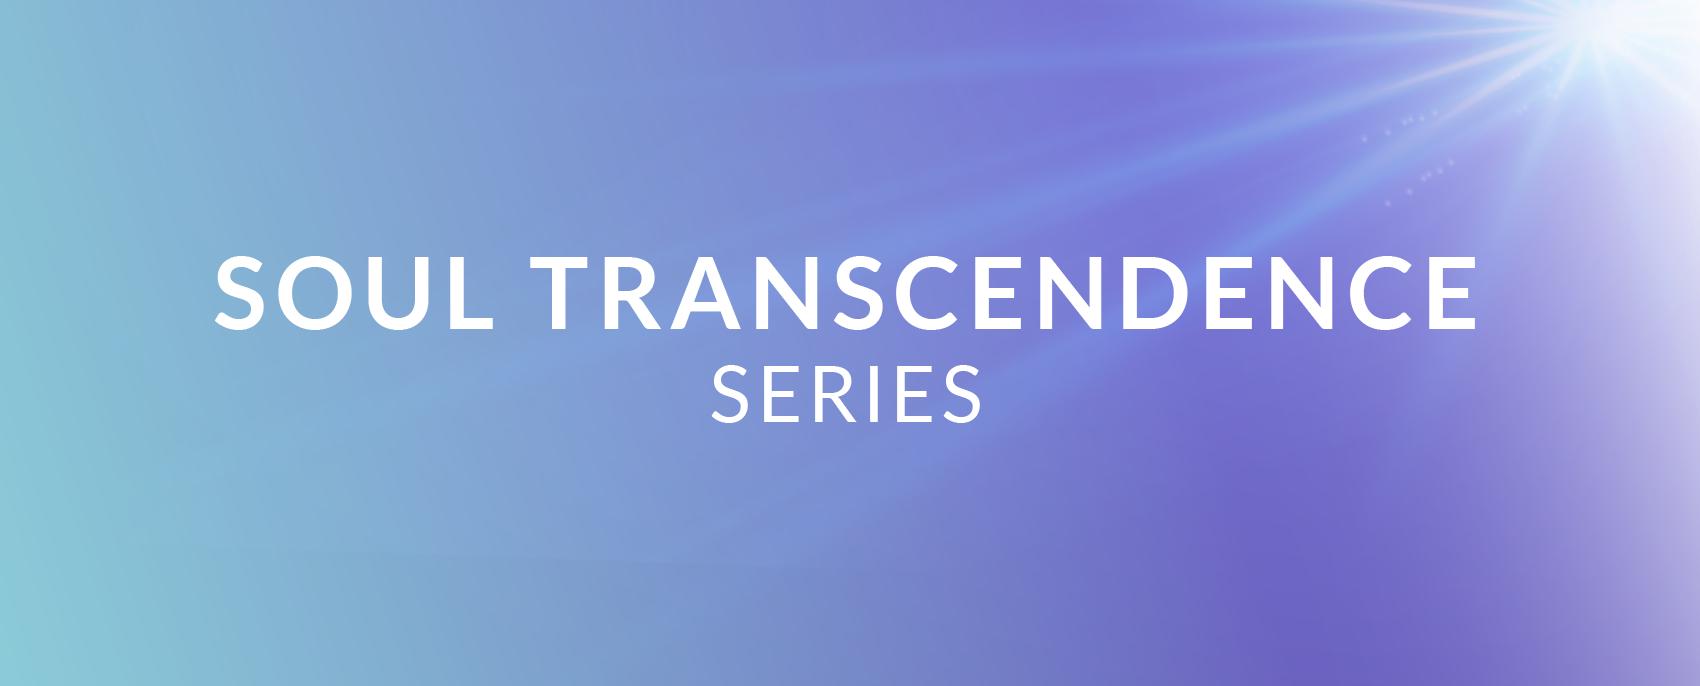 Soul Transcendence Series